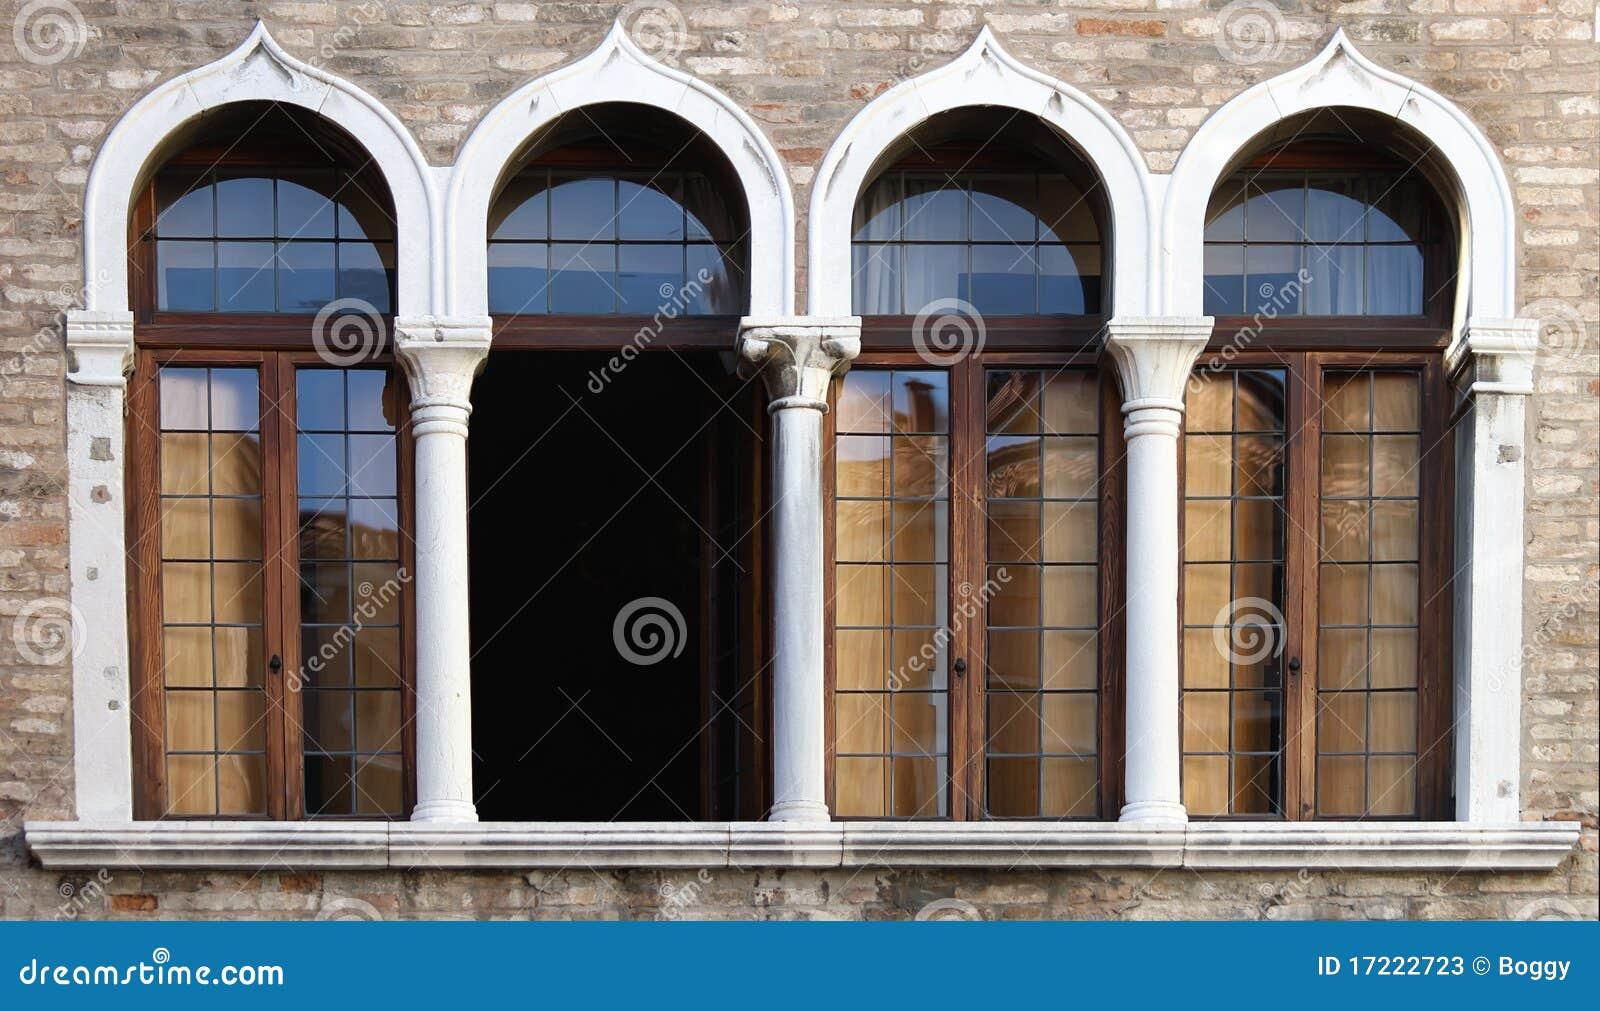 Finestre veneziane fotografie stock immagine 17222723 - Veneziane per finestre prezzi ...